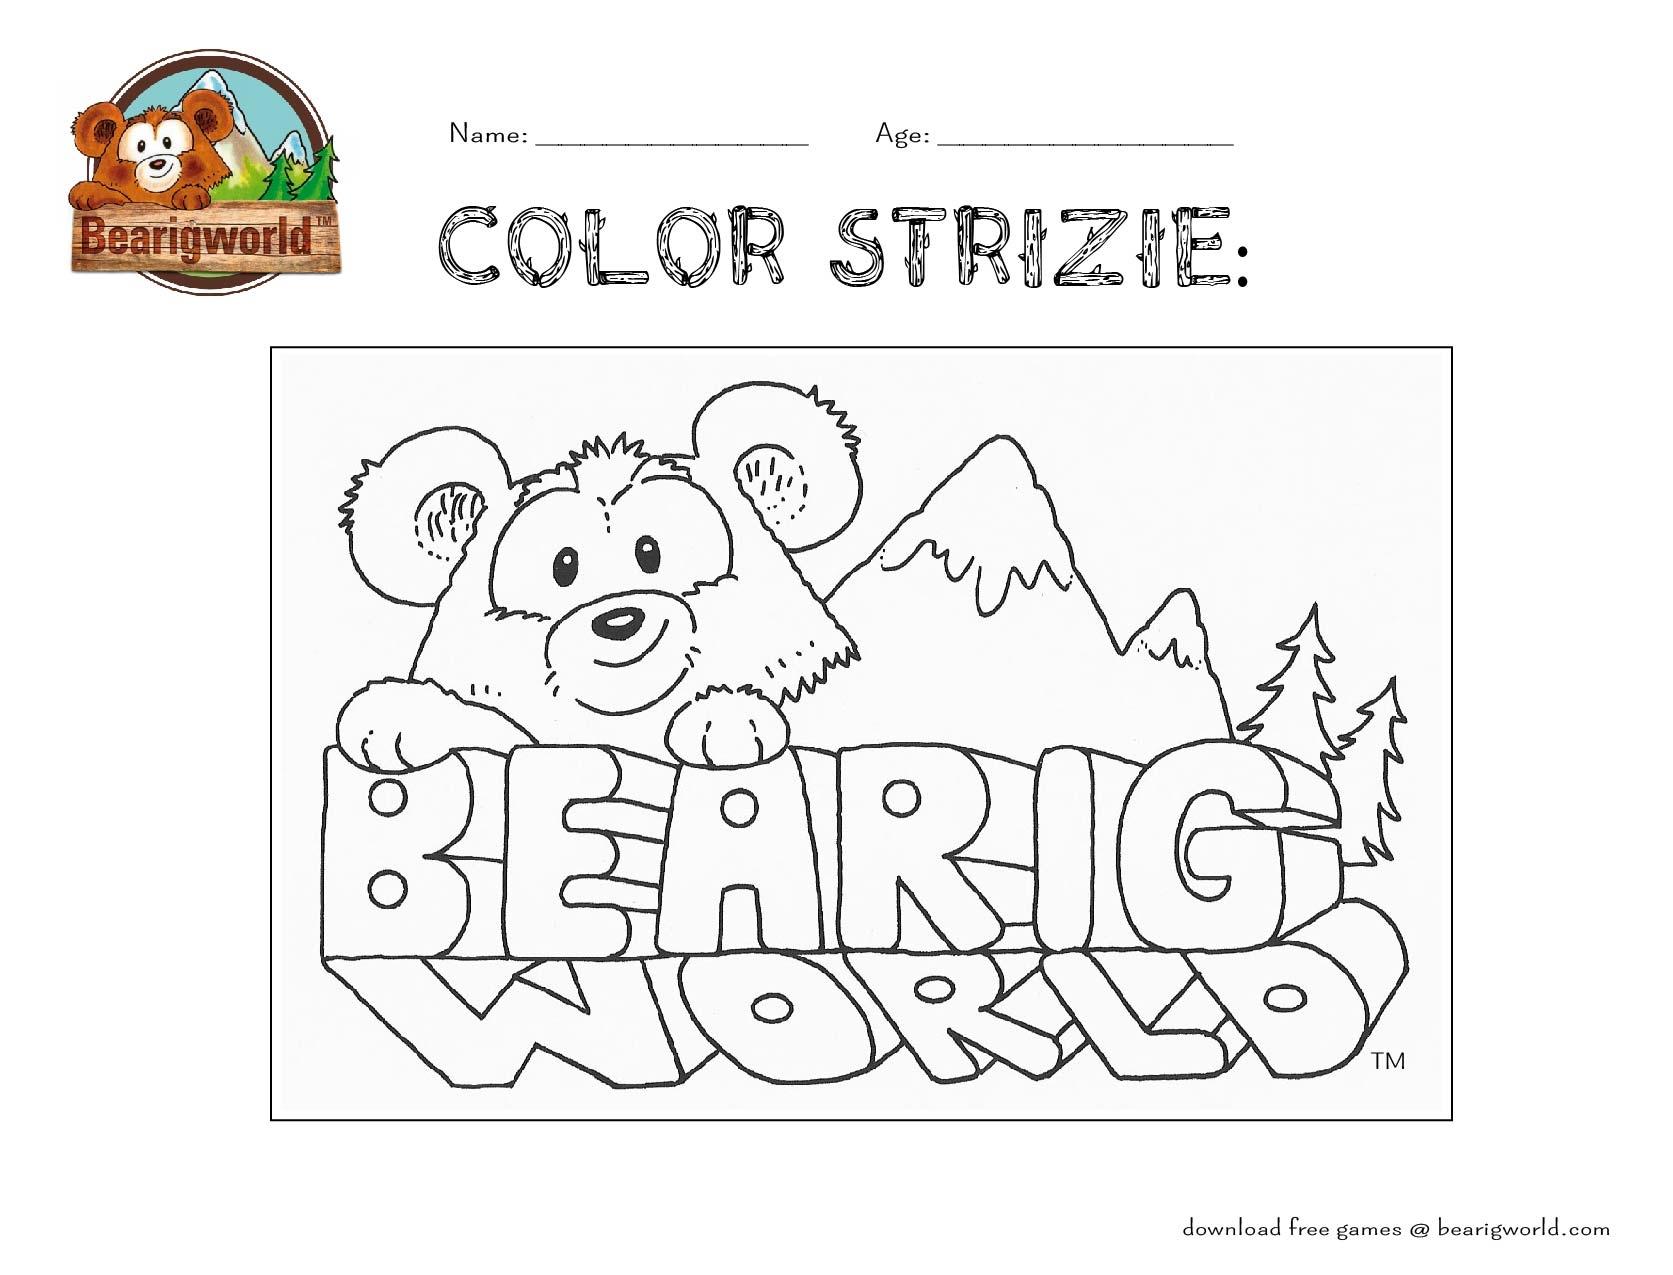 Coloring_LogoBlocks.jpg